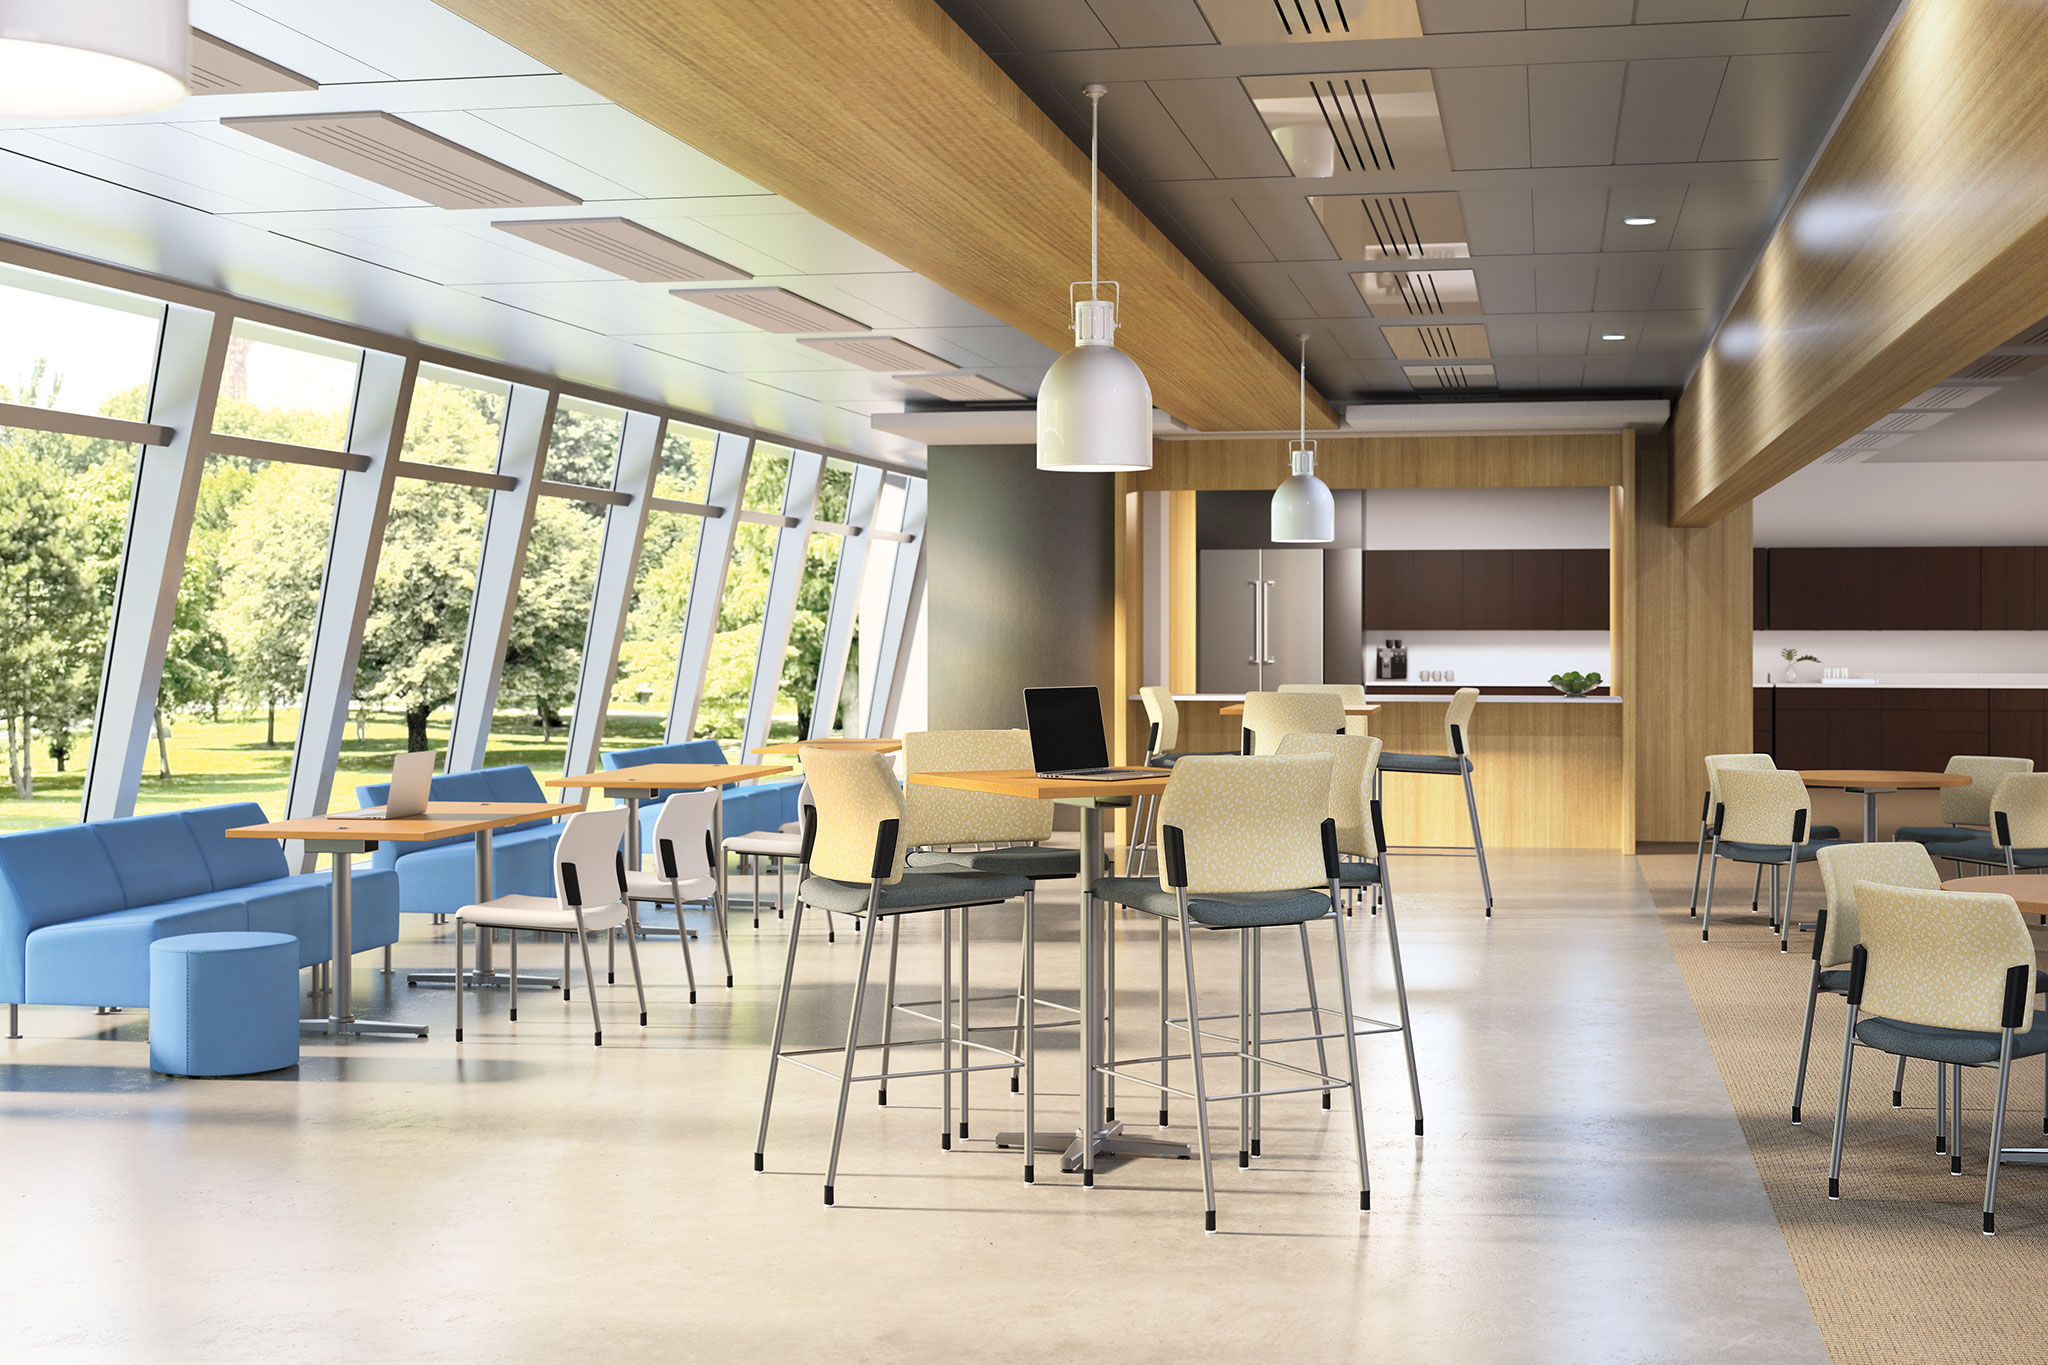 Office Cafeteria Furniture